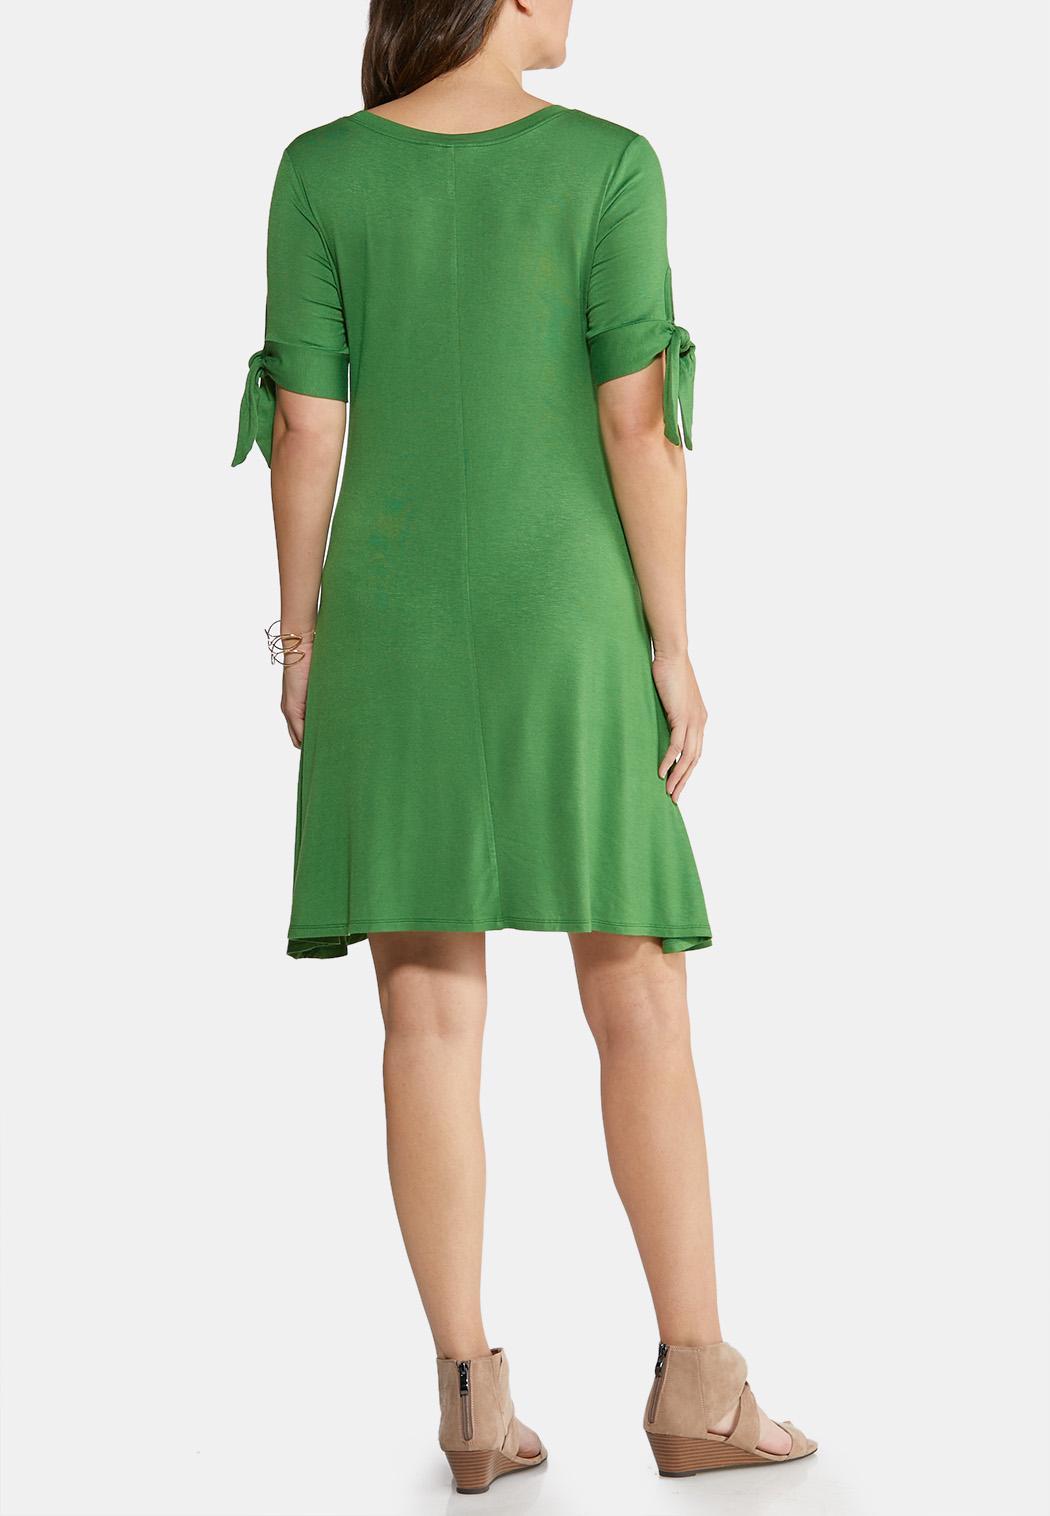 Bow Sleeve Swing Dress (Item #43853257)